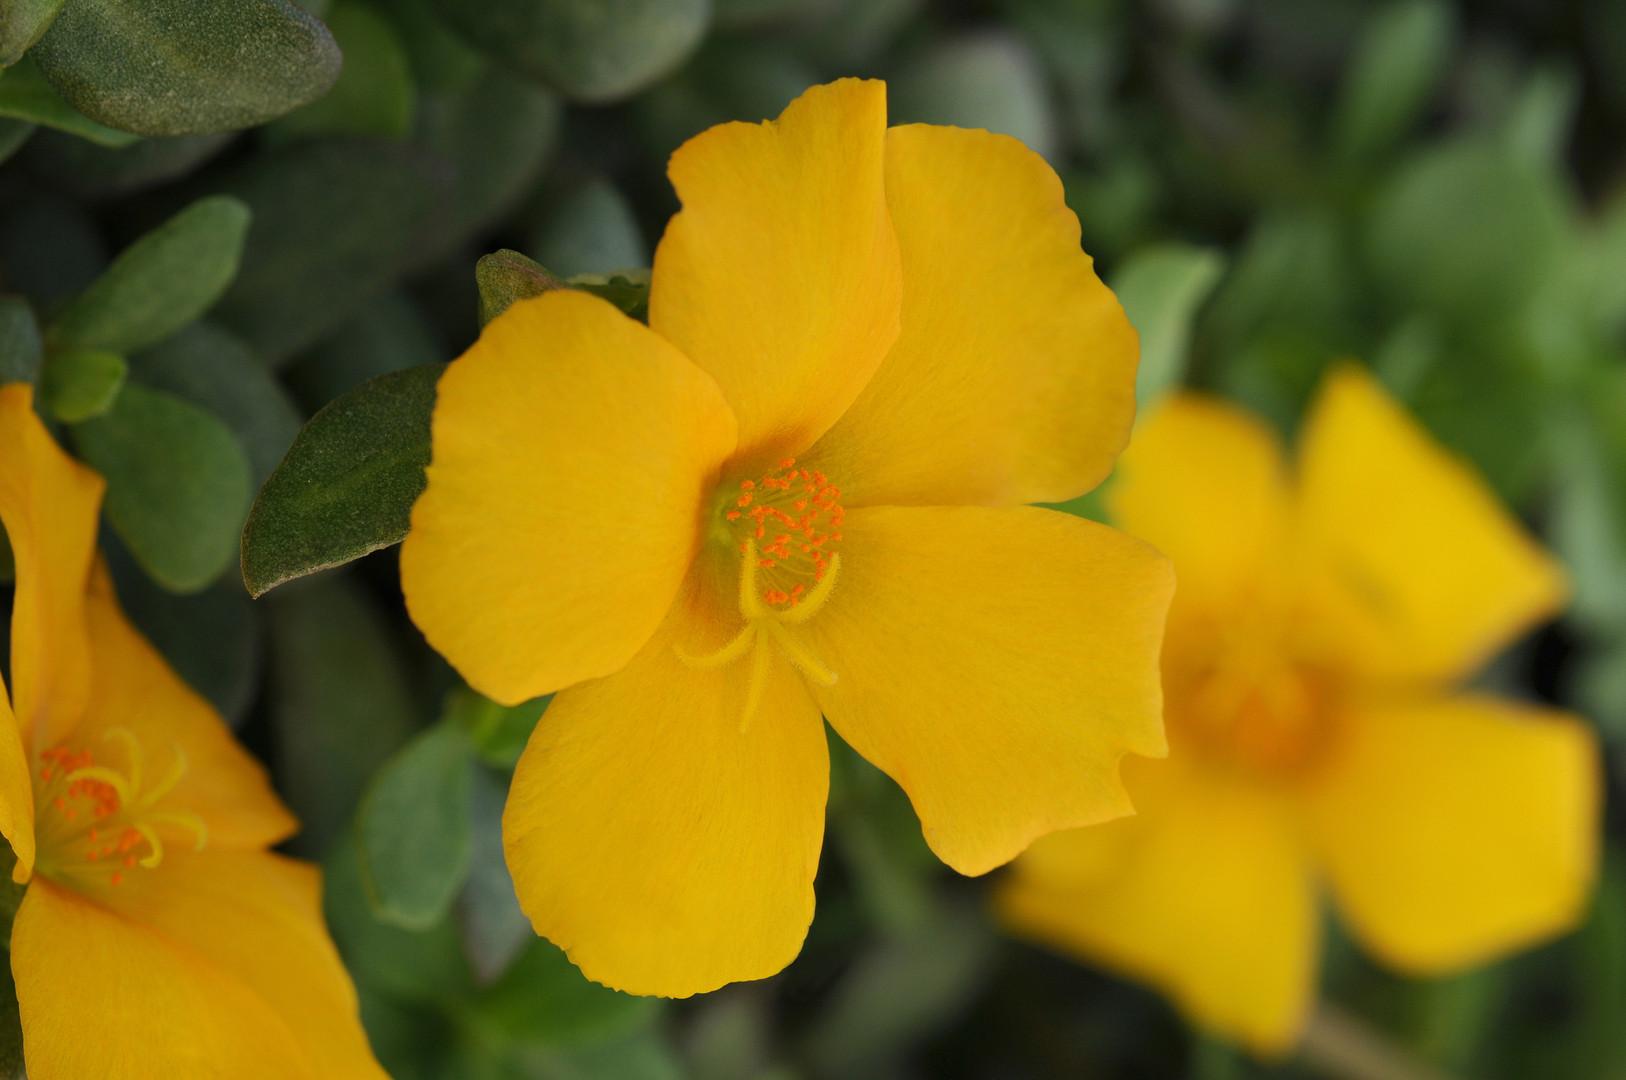 Purslane_PortoGrande_Yellow_Bloom_7974.j